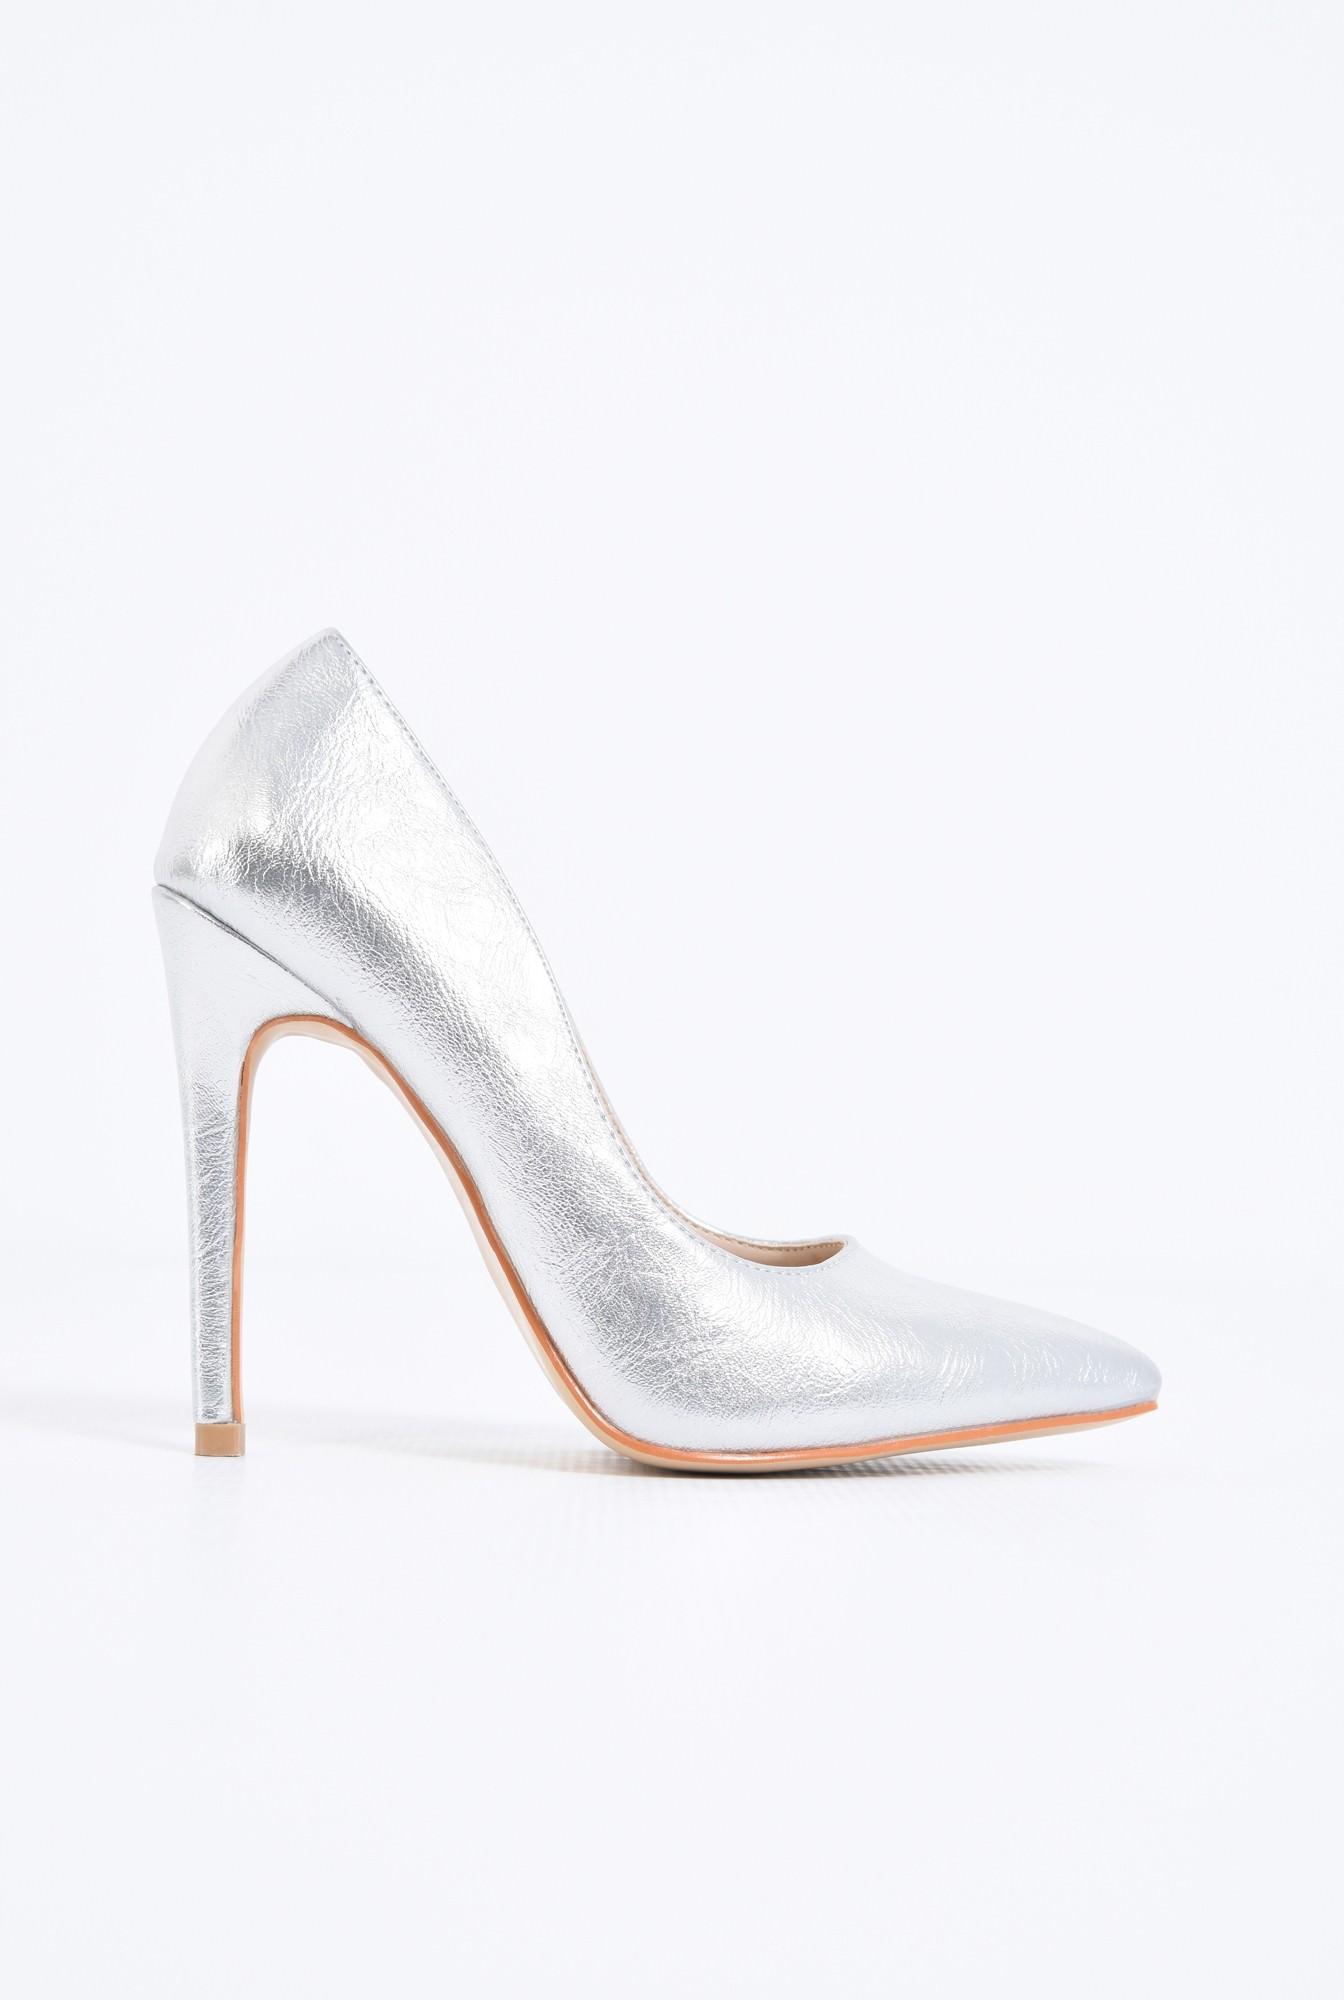 0 - pantofi dama, stiletto, argintiu, metalic